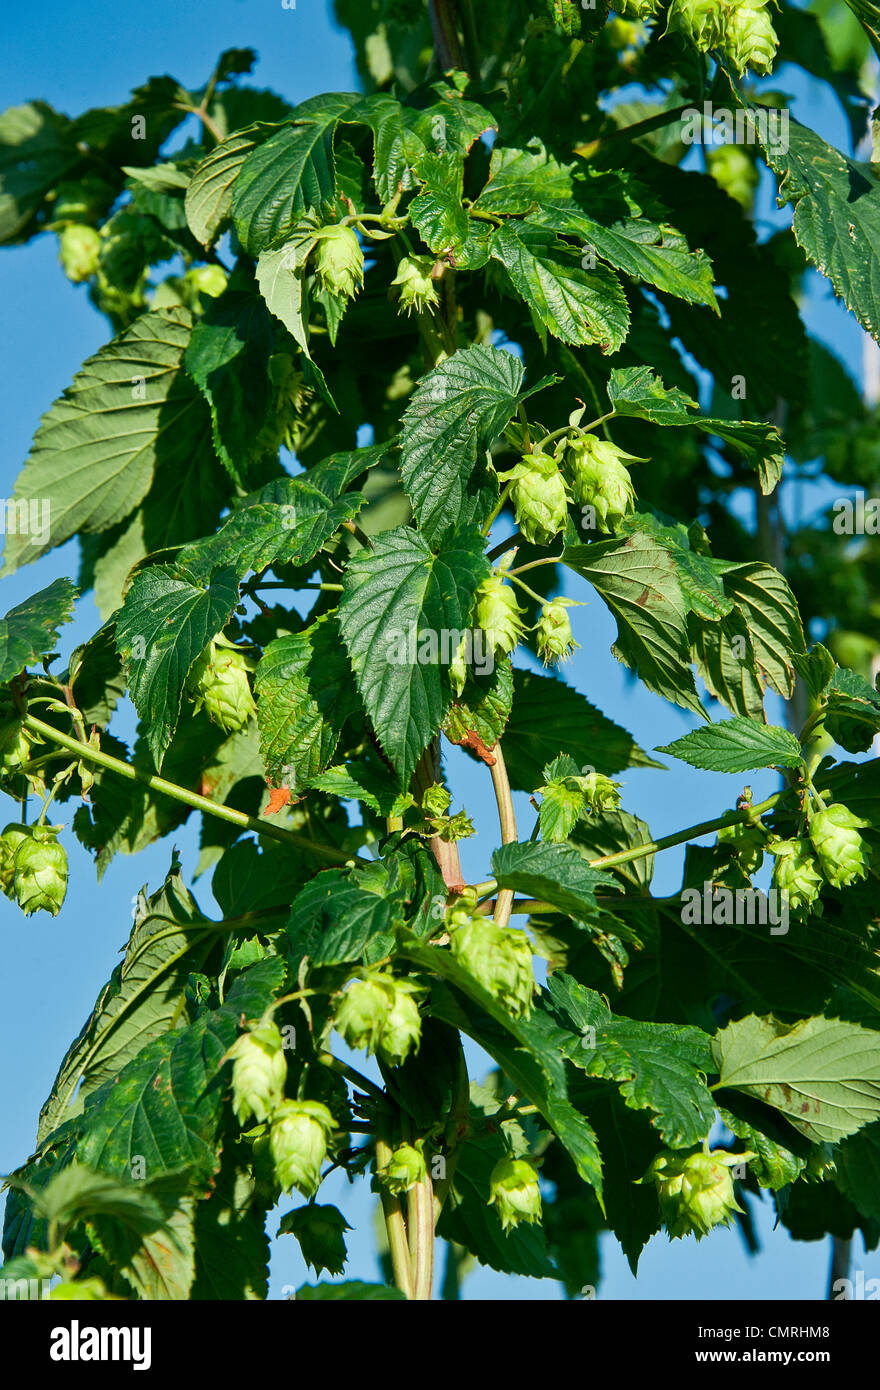 Hops plant, Humulus lupulus. - Stock Image